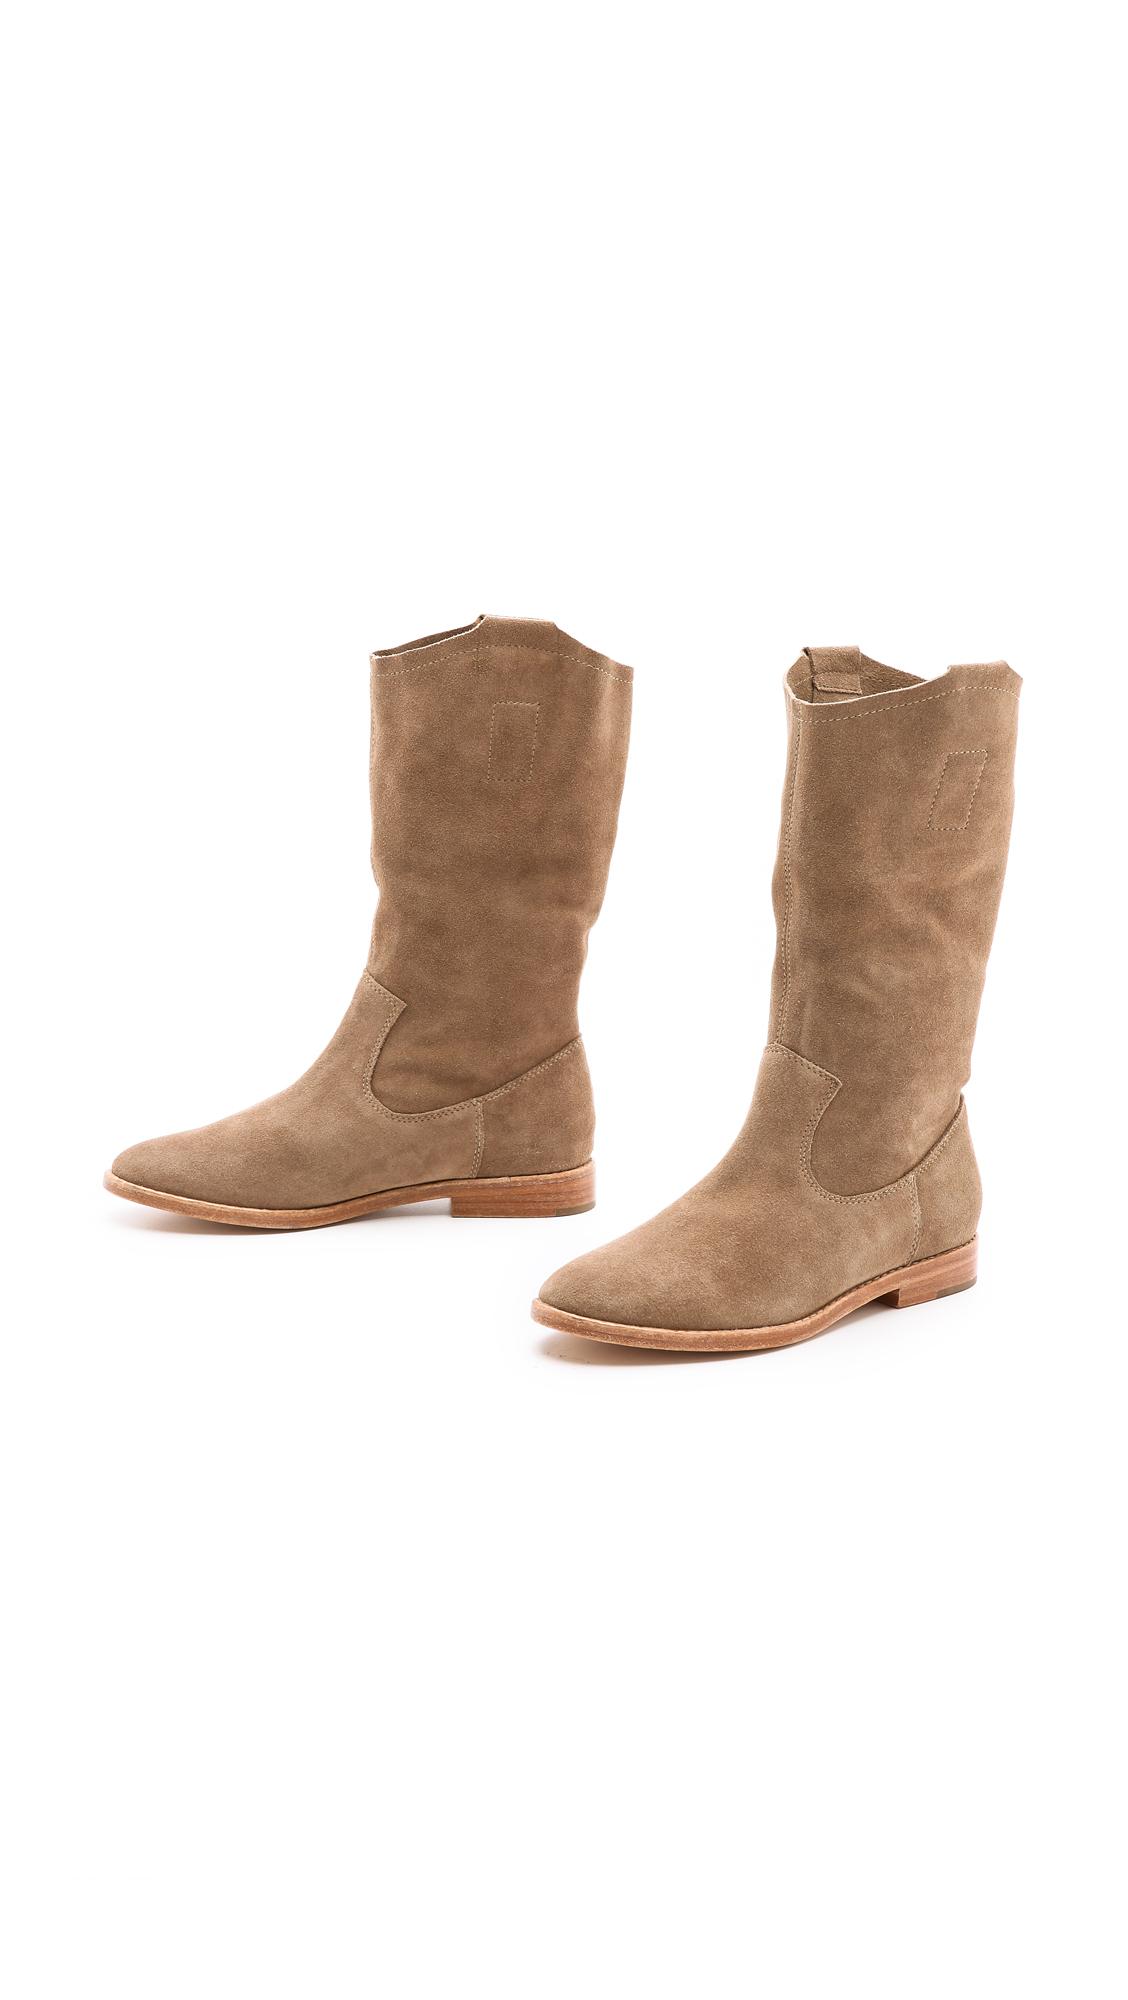 Joie Ogden Flat Suede Boots in Brown - Lyst